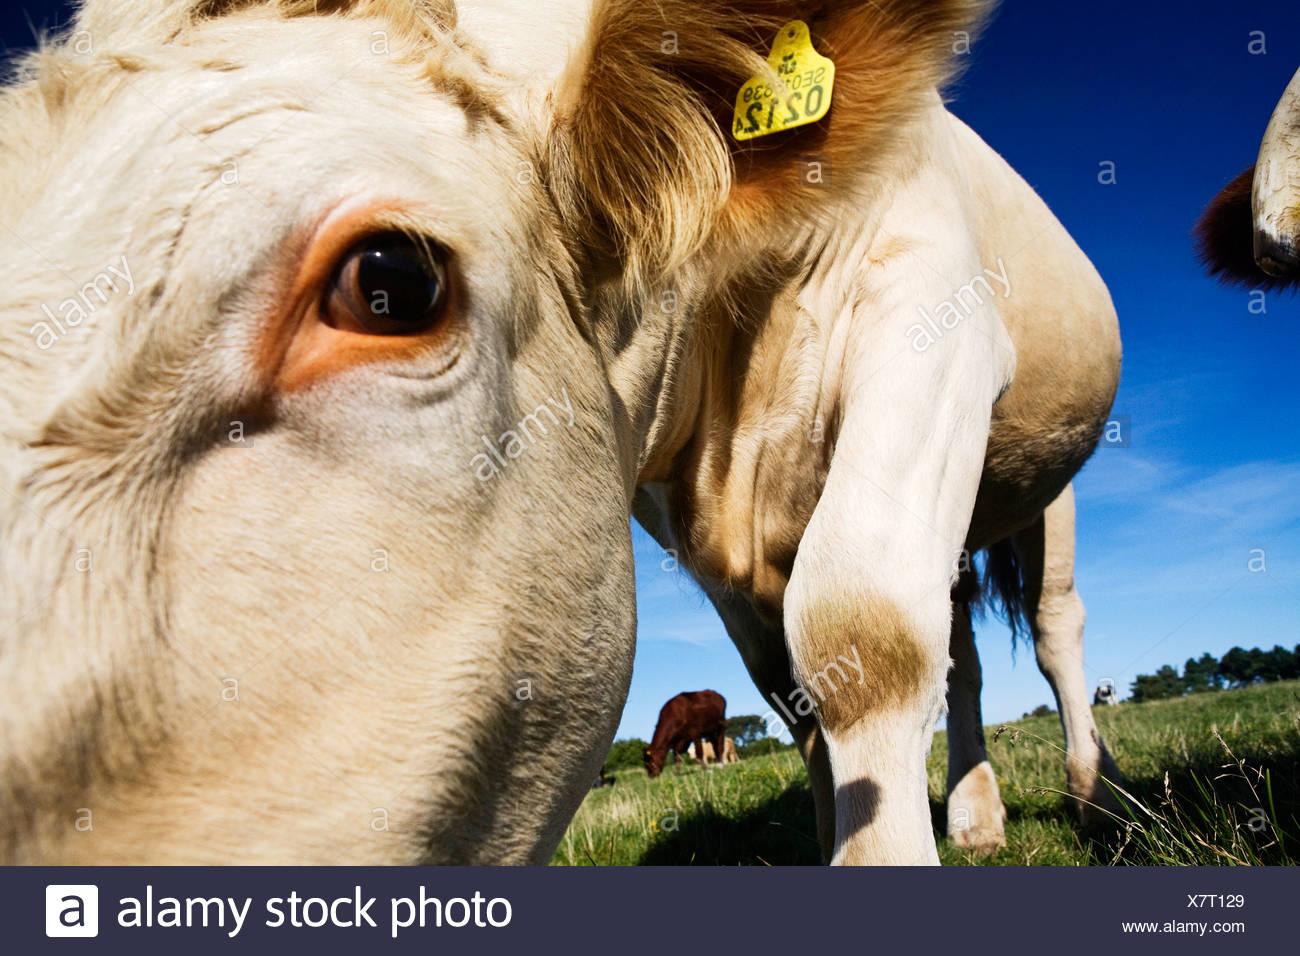 Cattle grazing, Sweden. - Stock Image